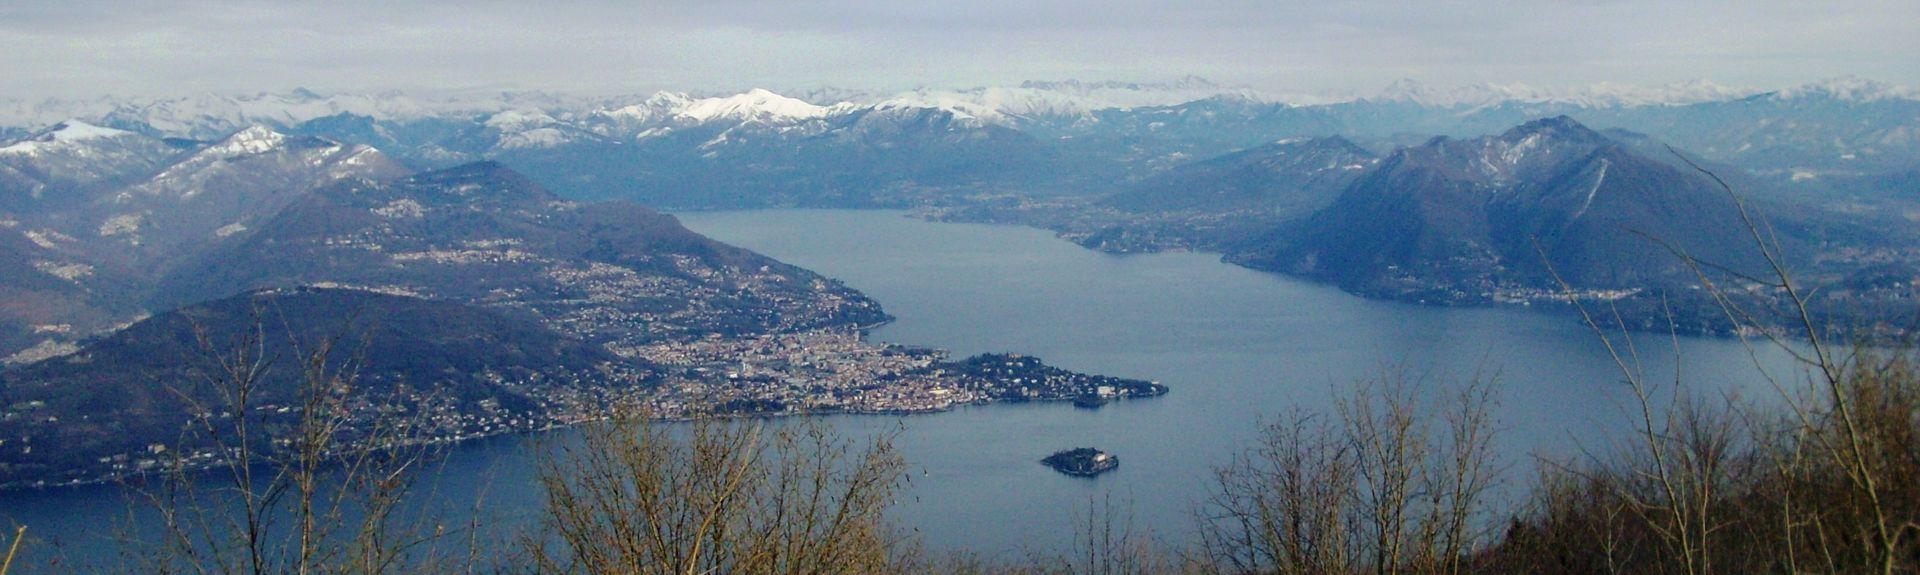 Someraro, Verbano-Cusio-Ossola, Piedmont, Italy